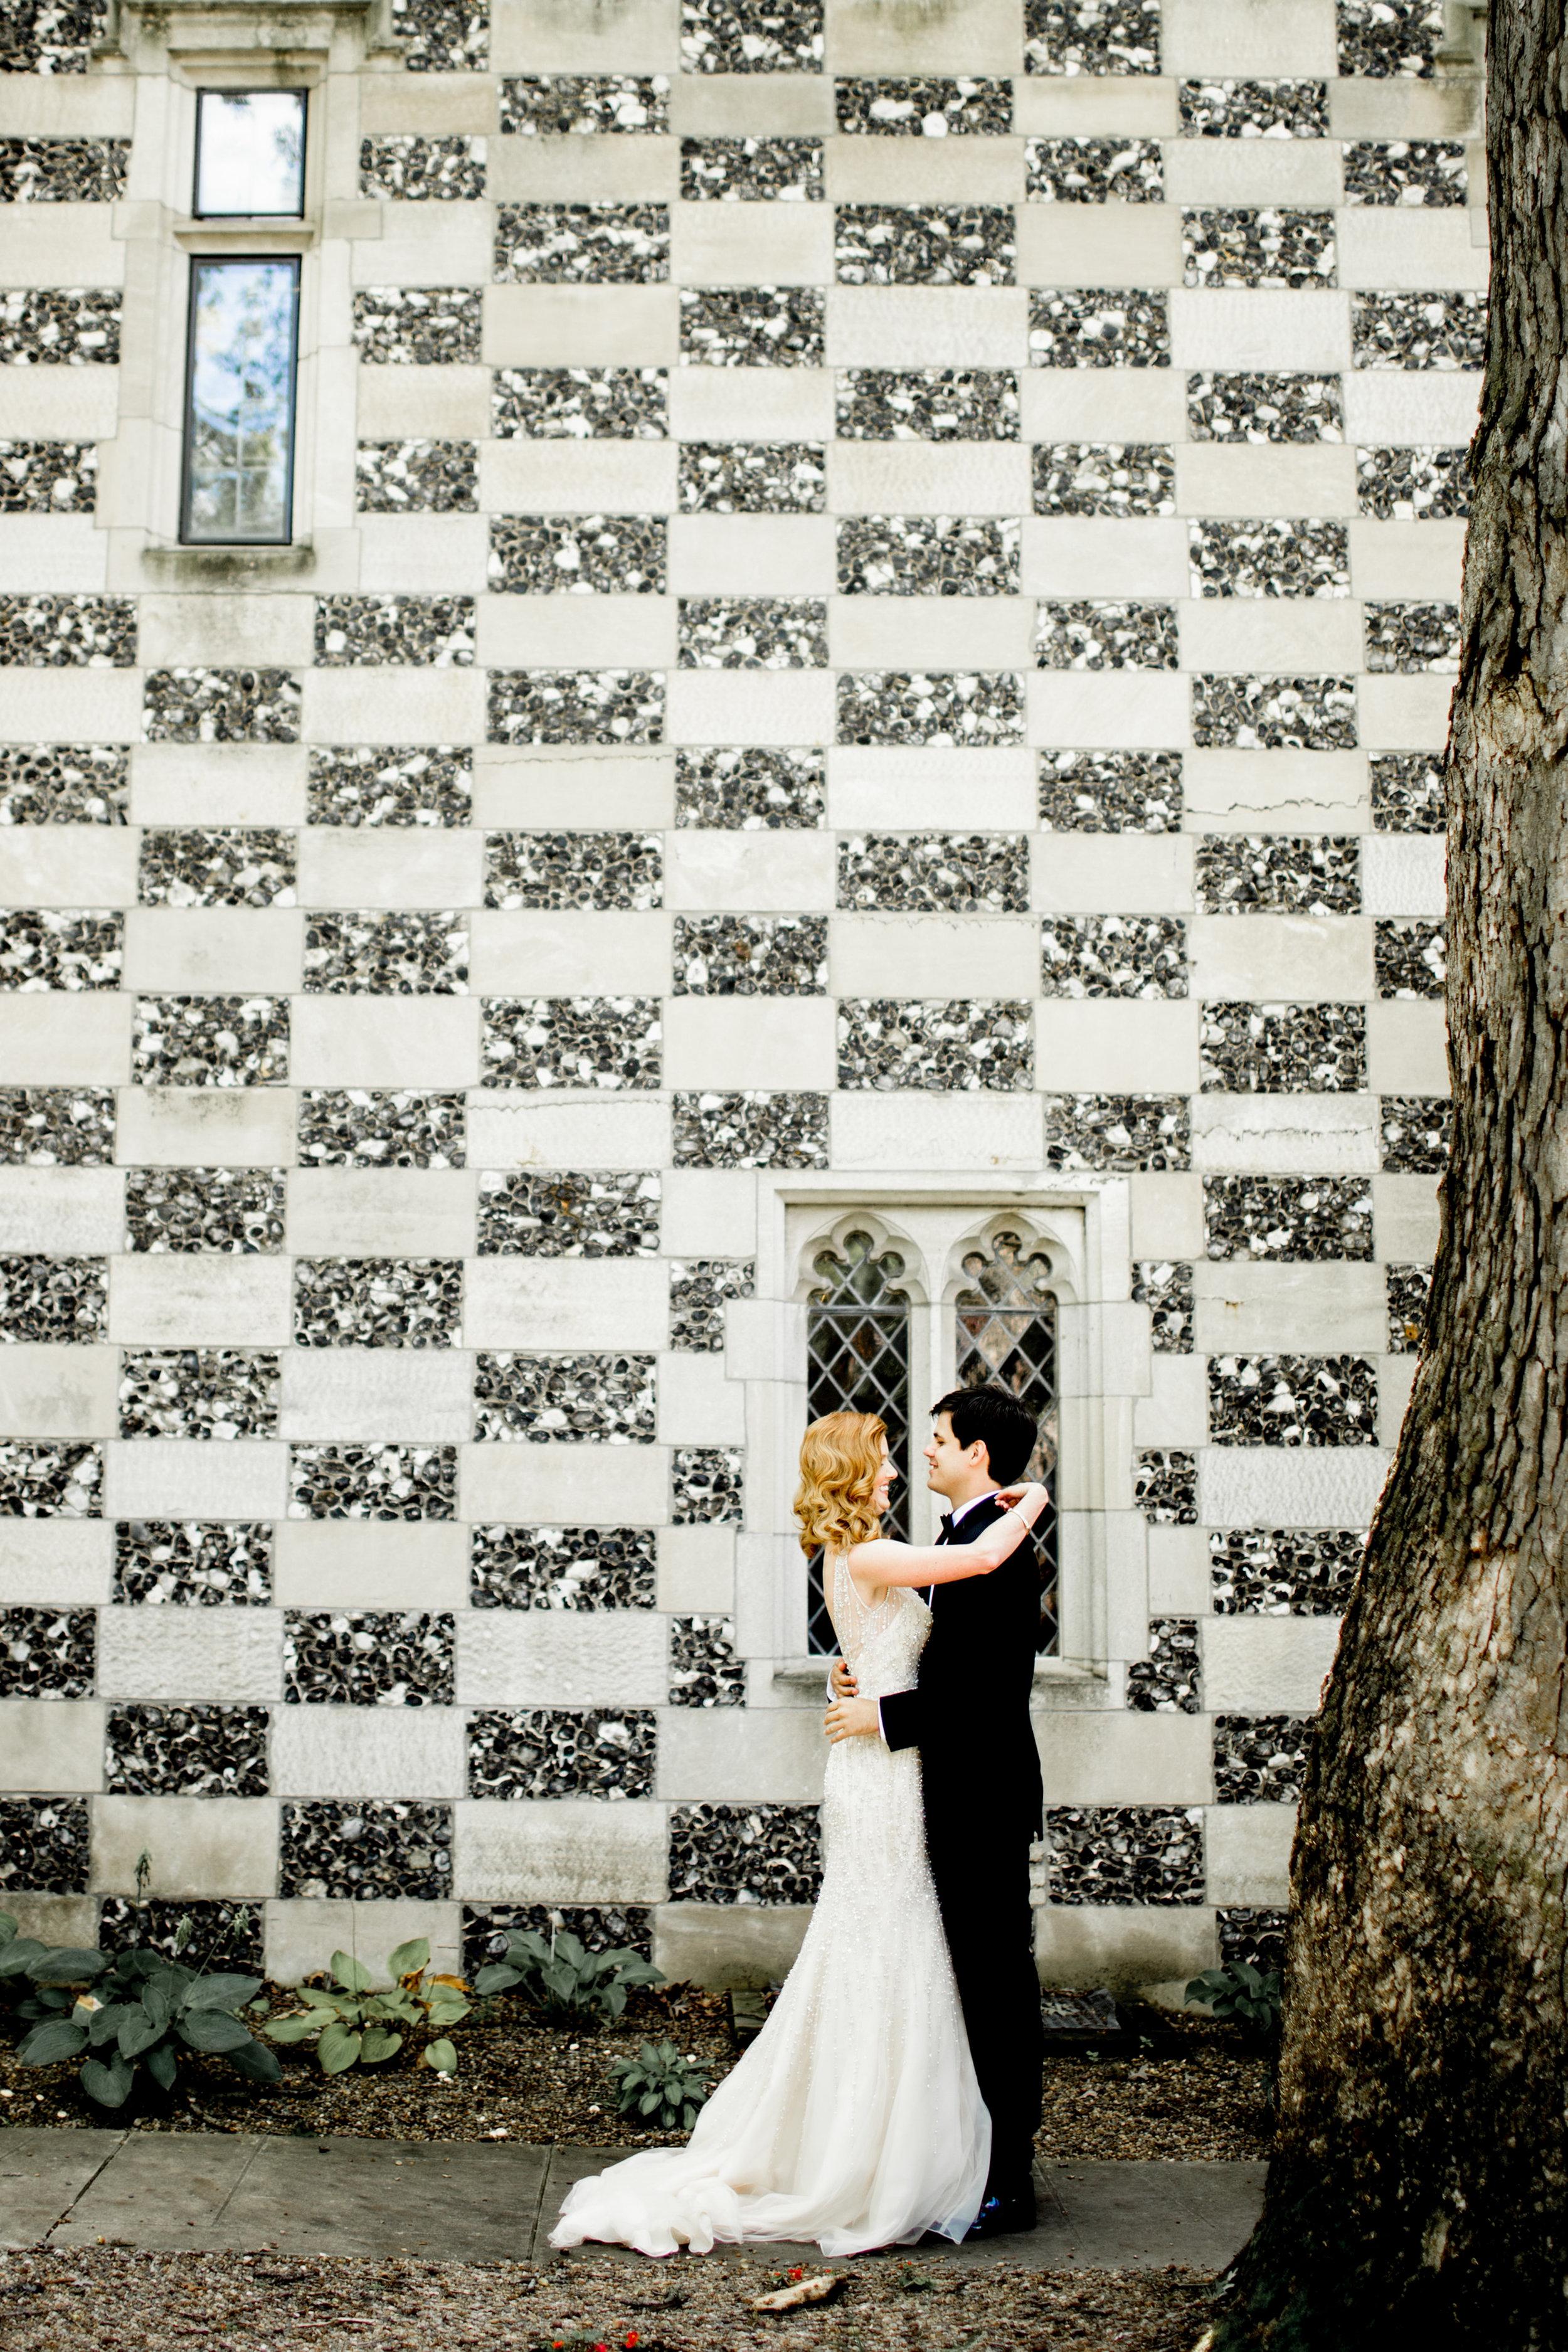 Colleen & Sam Wed-100.jpg